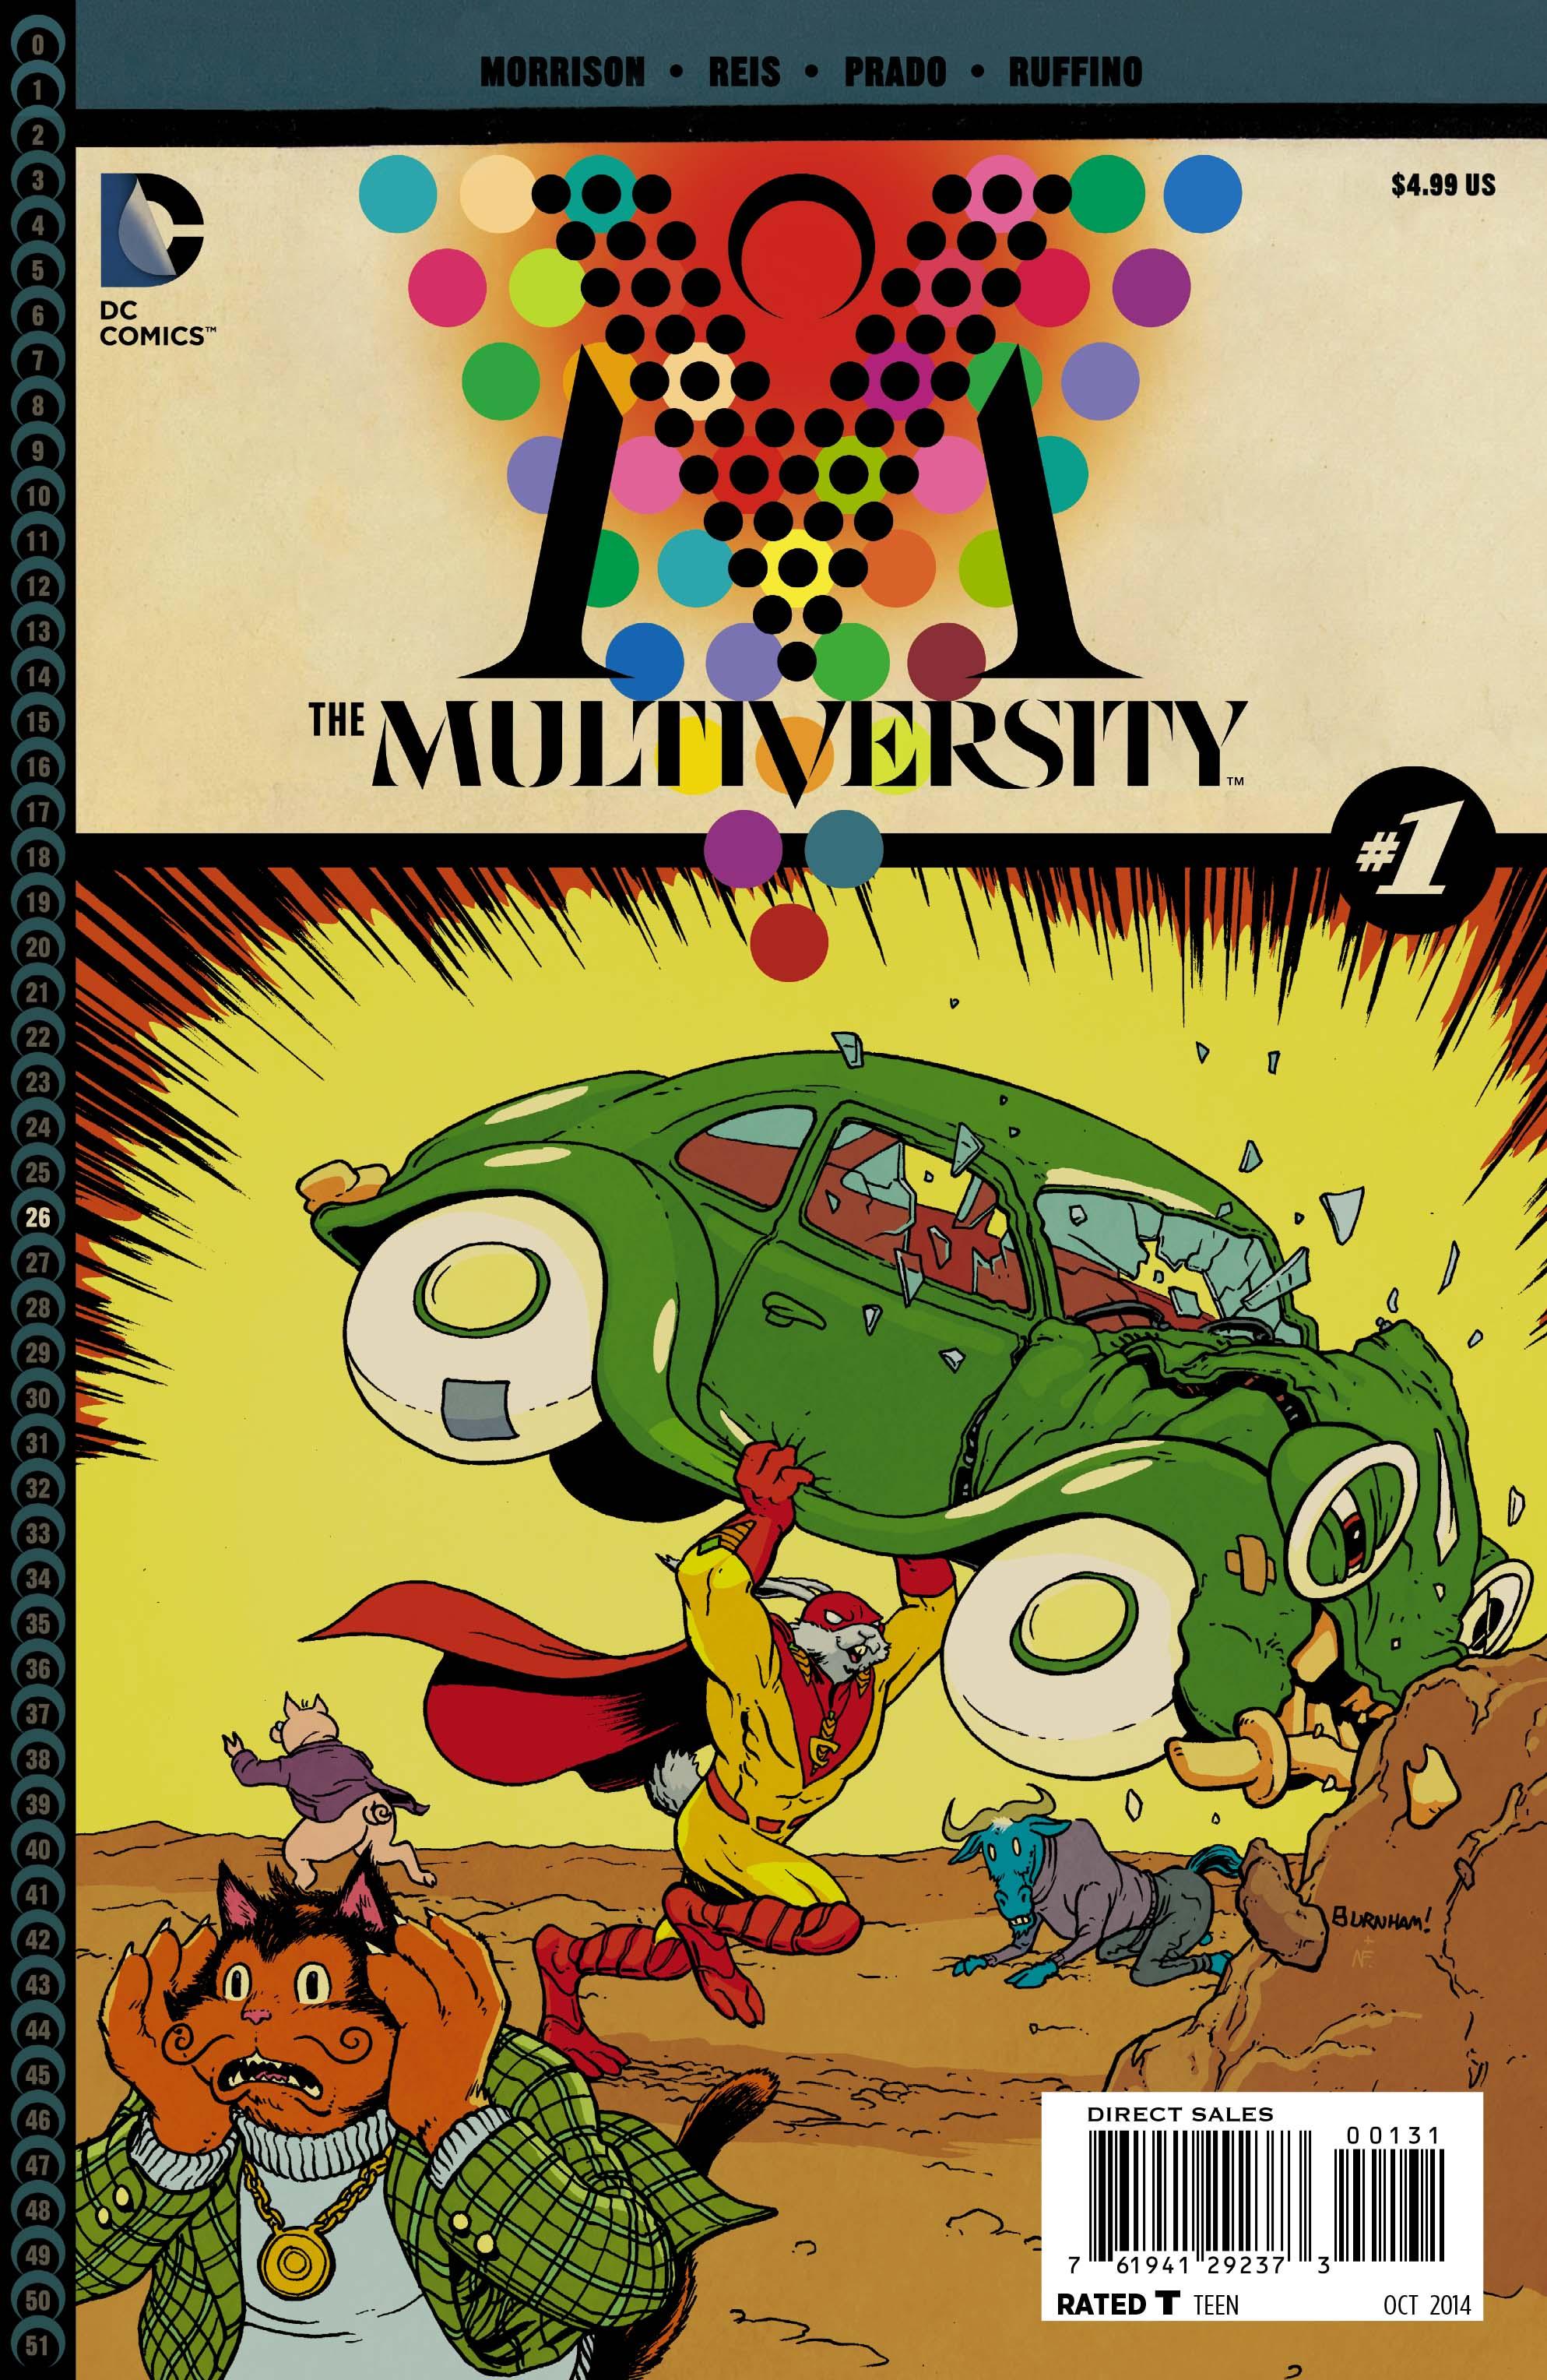 The Multiversity Pics, Comics Collection